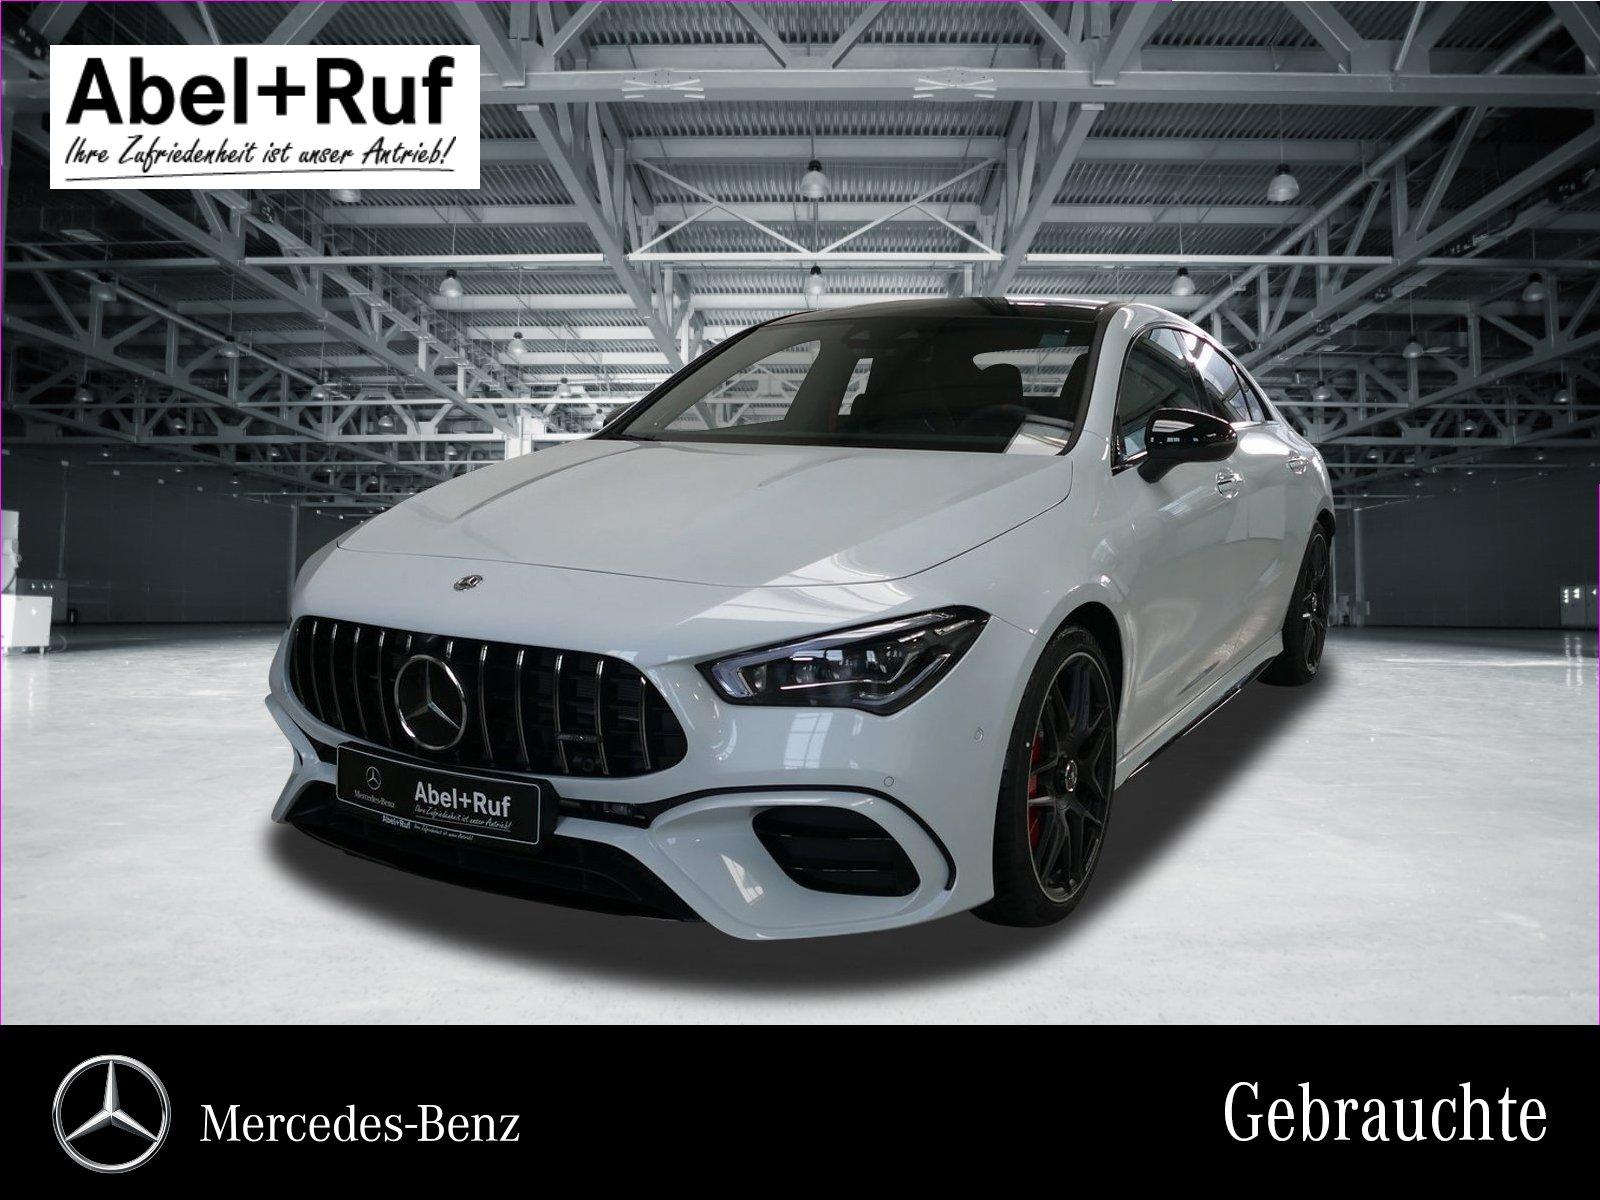 Mercedes-Benz CLA 45 4M S Coupé+NIGHT+PANORAMA-SHD+ASSISTENZ, Jahr 2020, Benzin